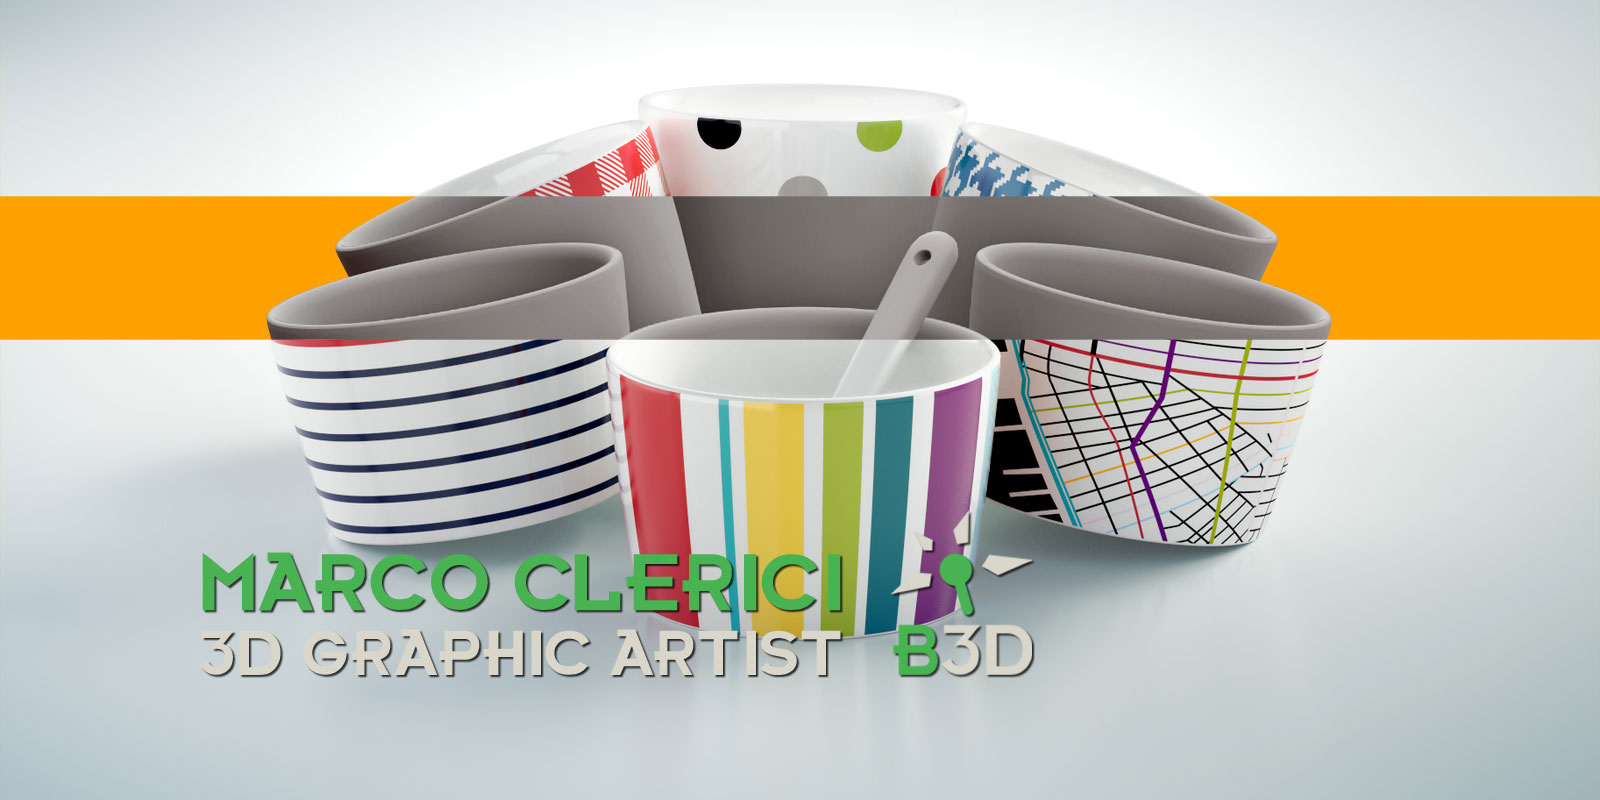 Liceo Artistico Michelangelo Como b3d – marco clerici portfolio - 3d artist portfolio